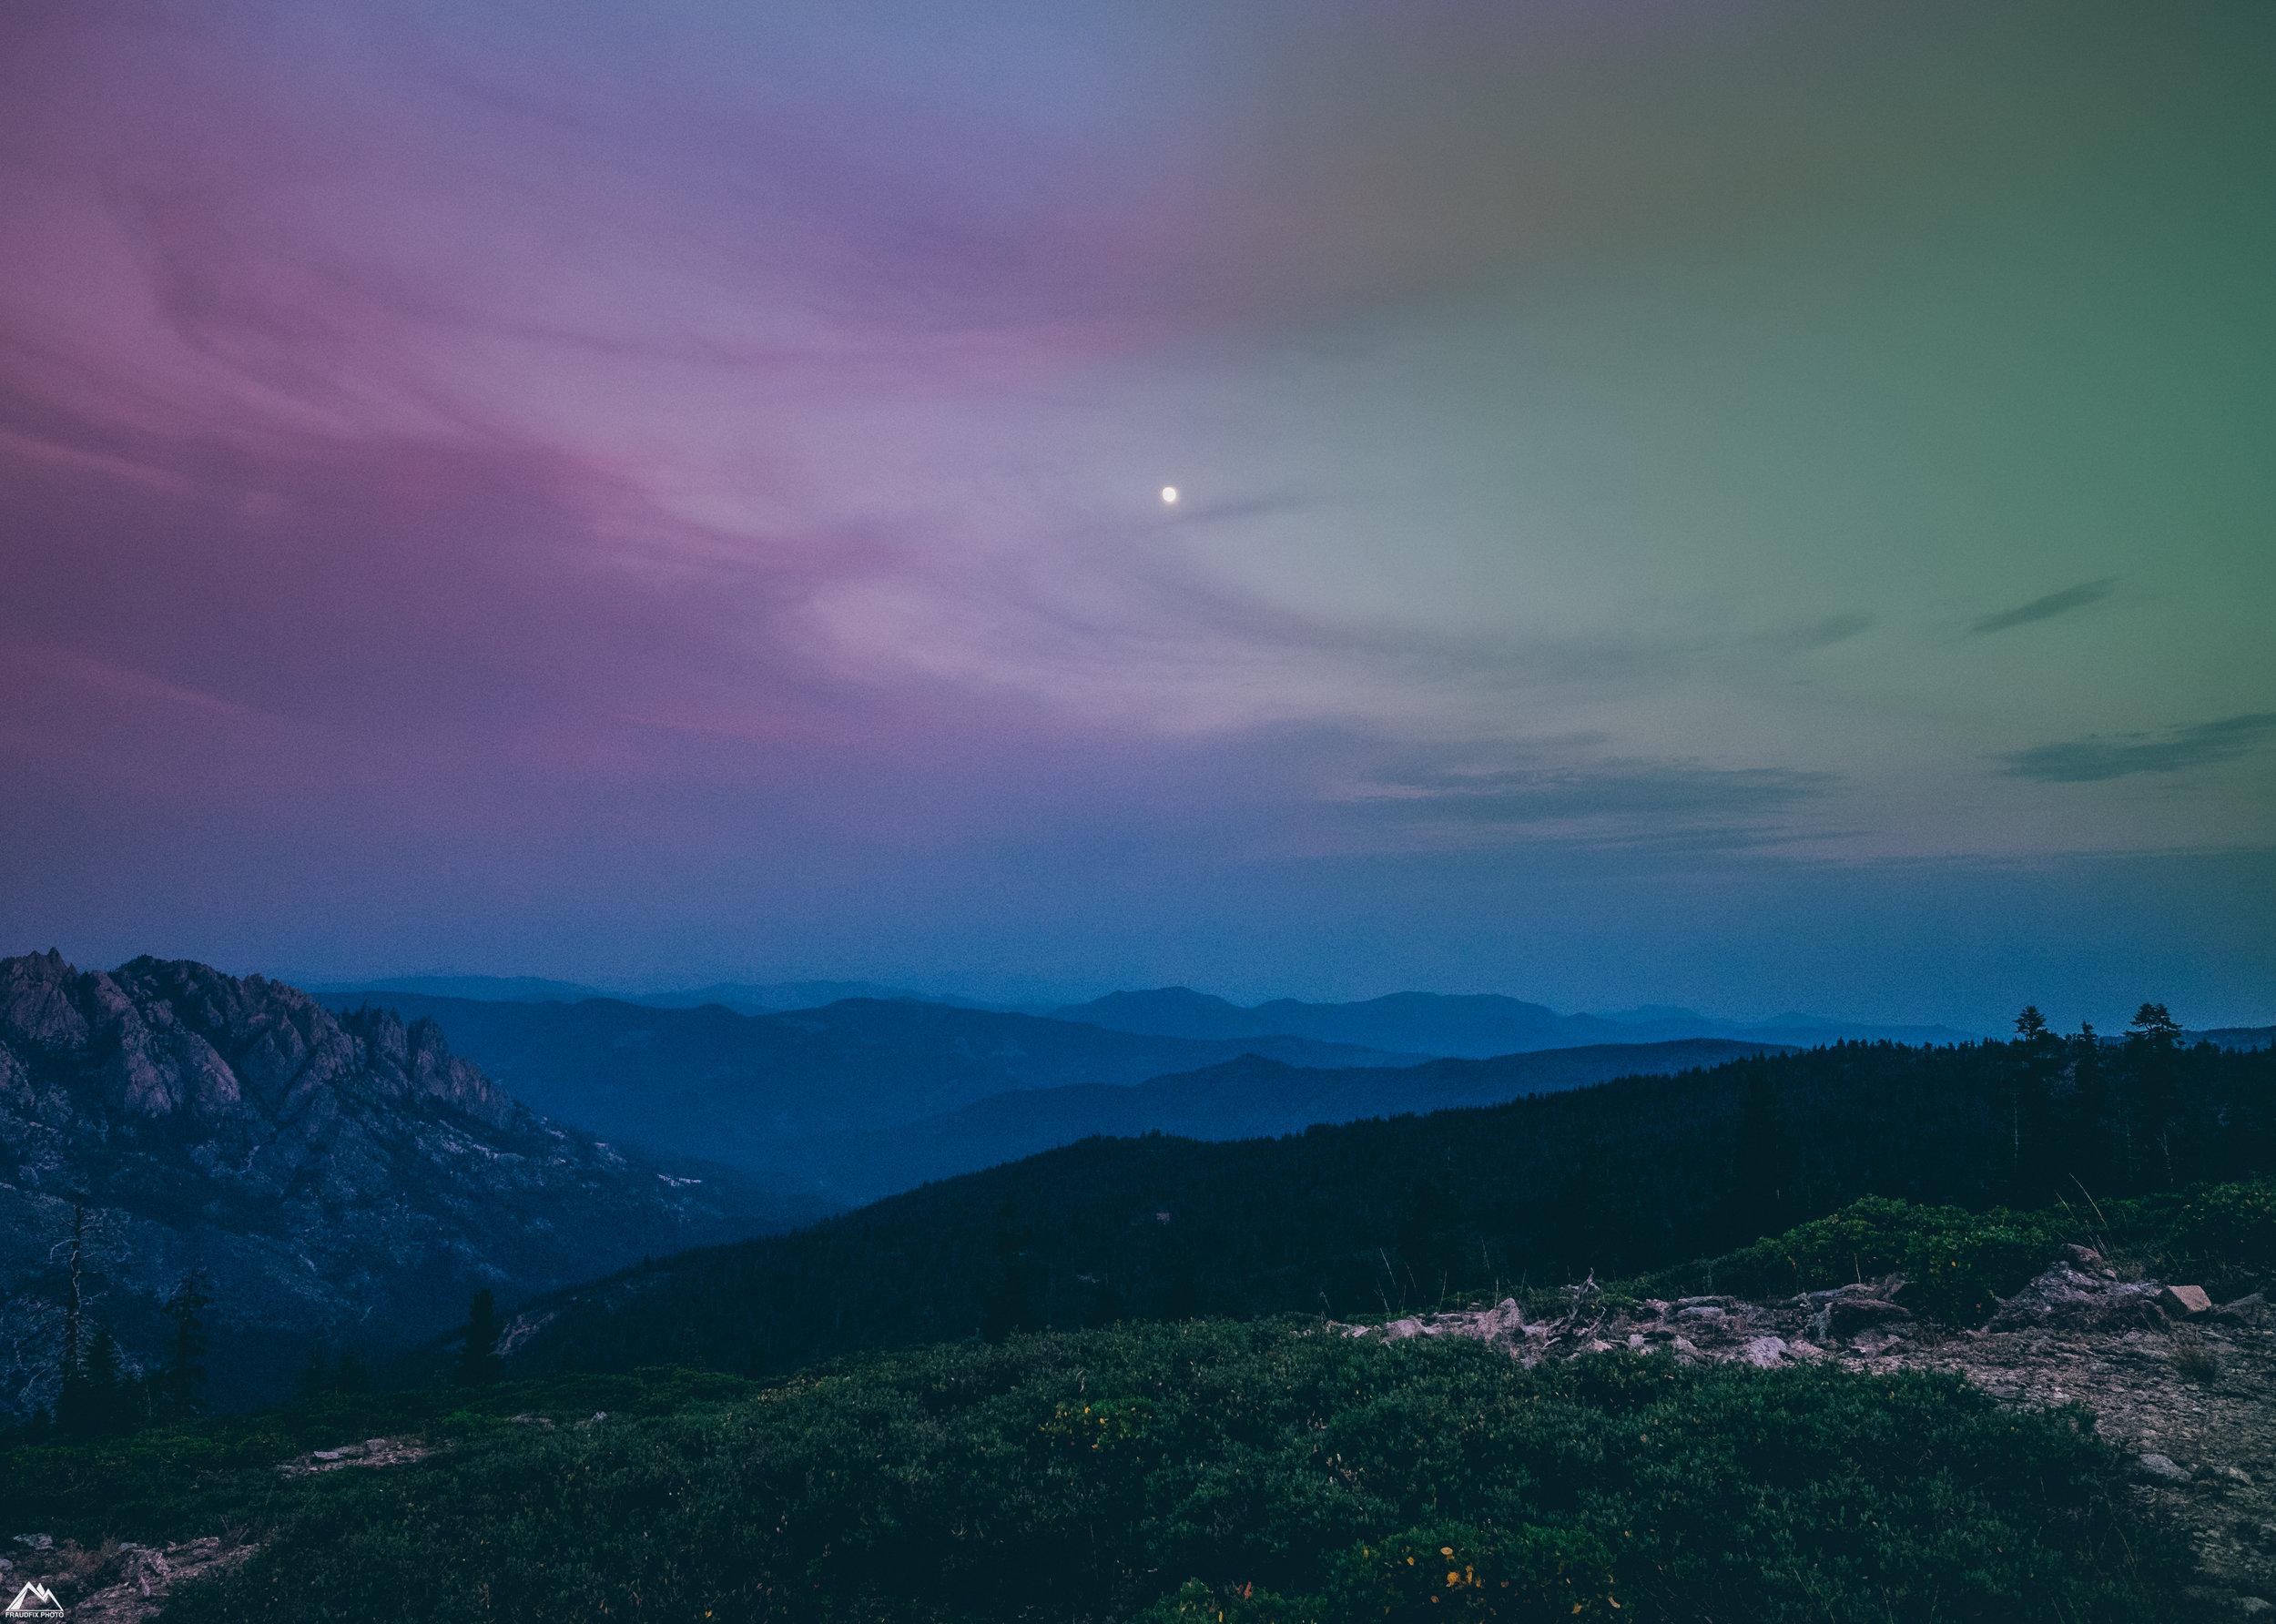 valley by moonlight